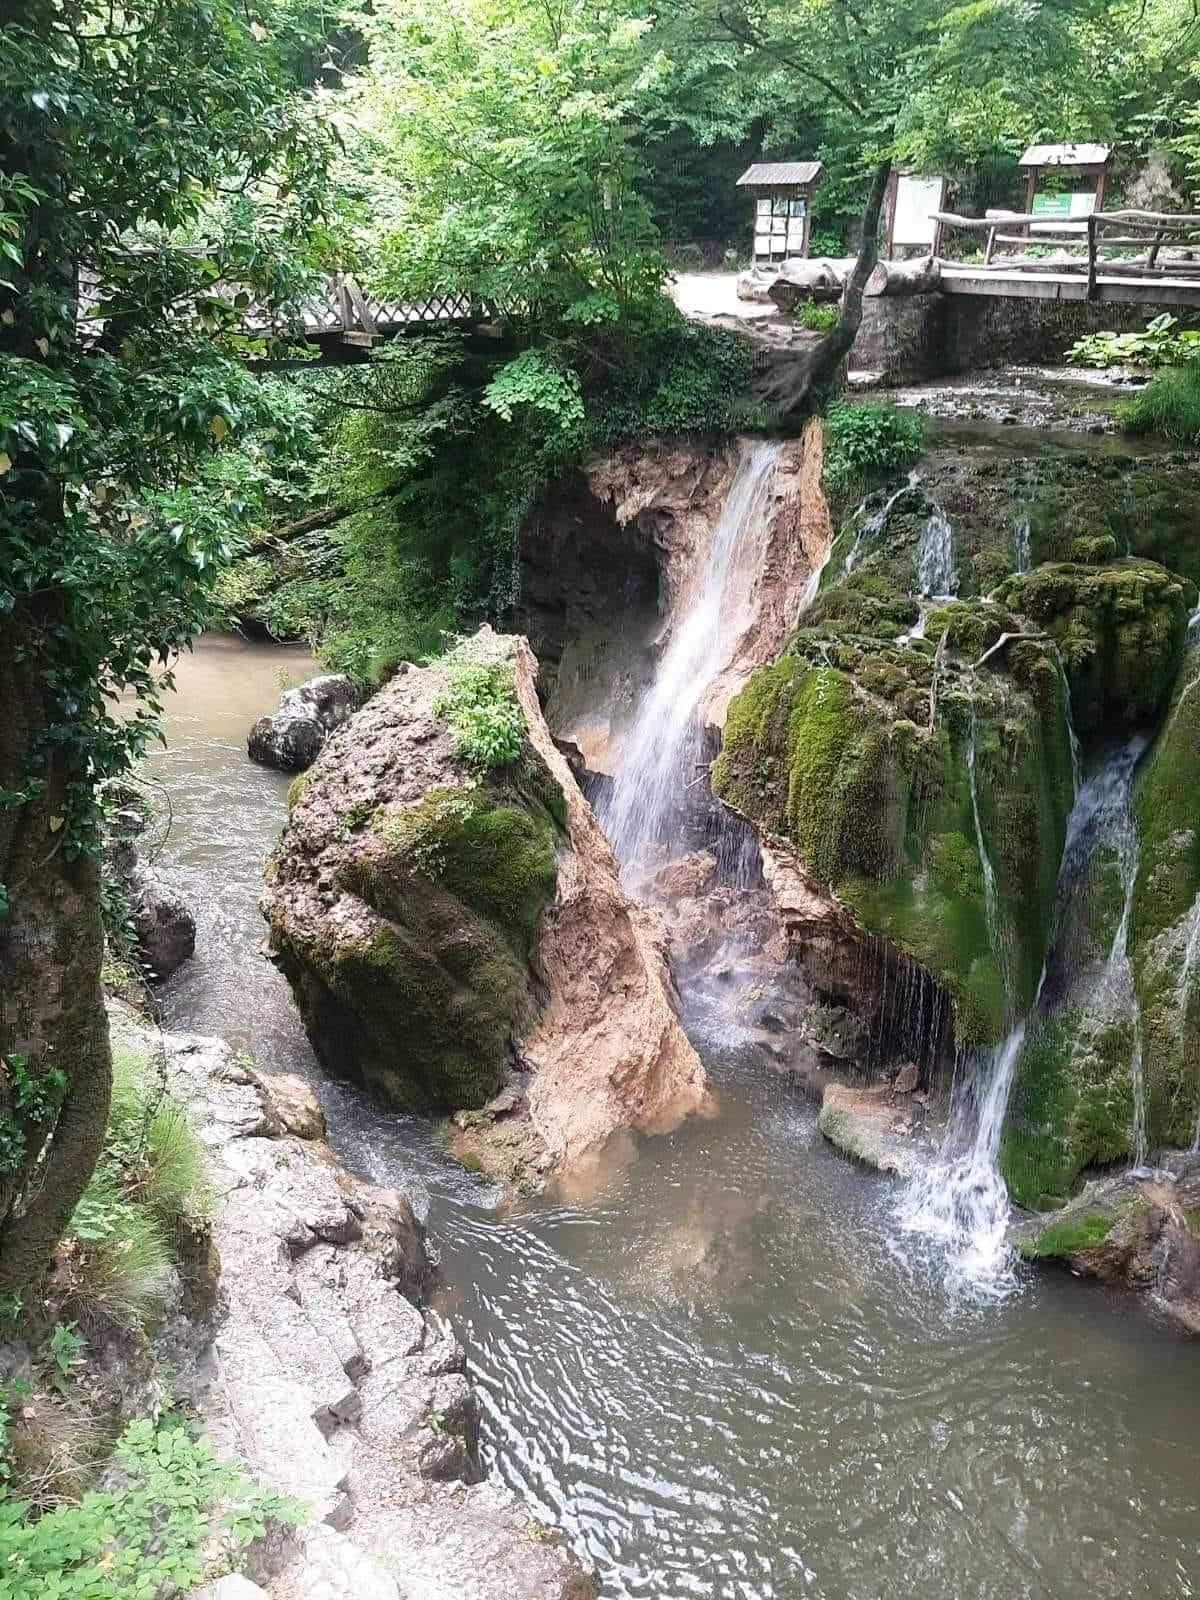 Cascada Bigar s-a prabusit astazi 07 iunie 2021